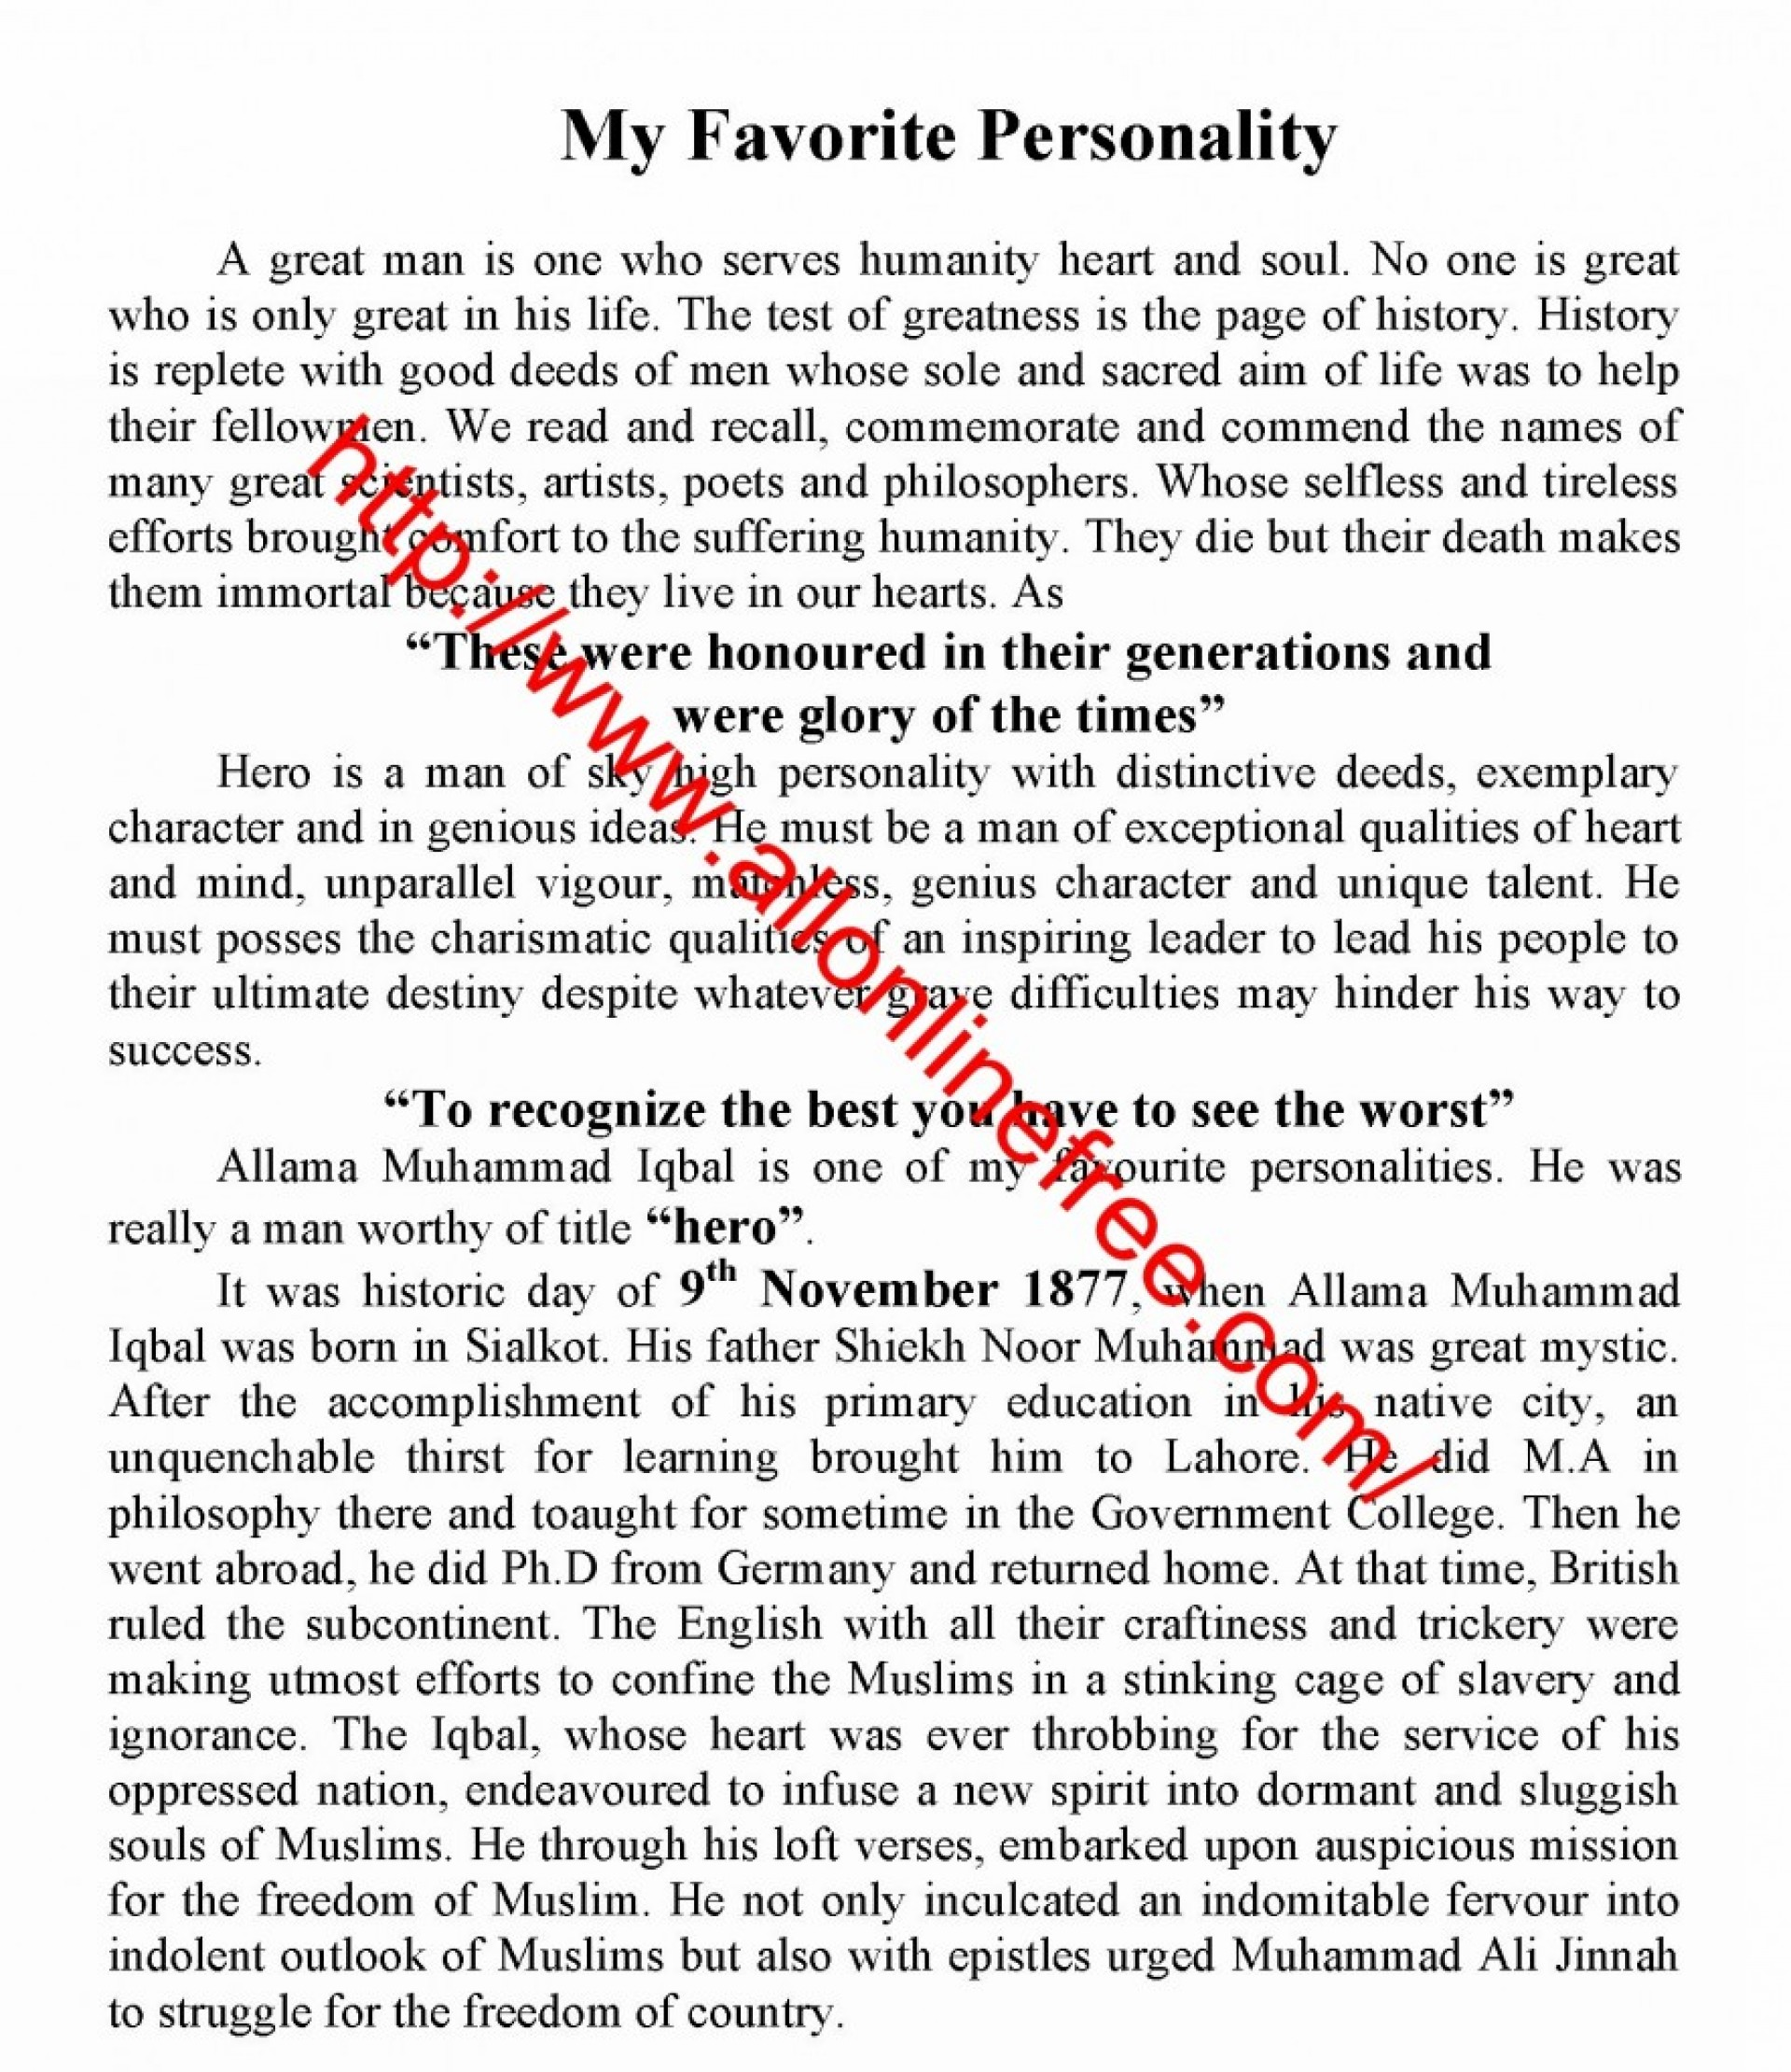 006 Essay Example Write My For Shocking Free App Argumentative Online 1920